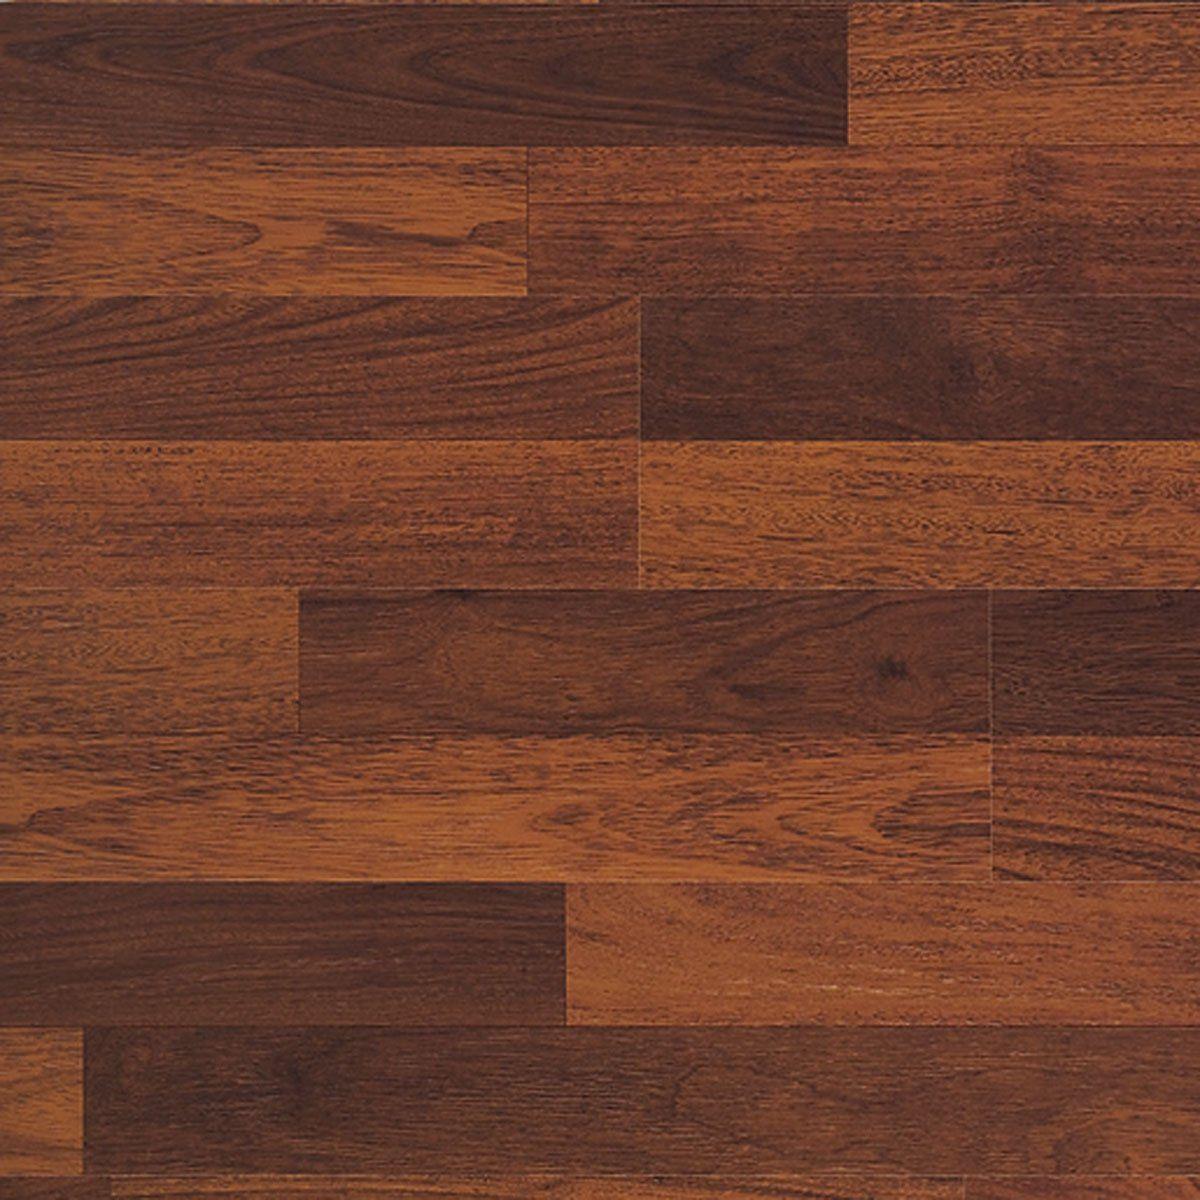 HOME COLLECTION Brazilian Cherry - 8mm Laminate Flooring ...